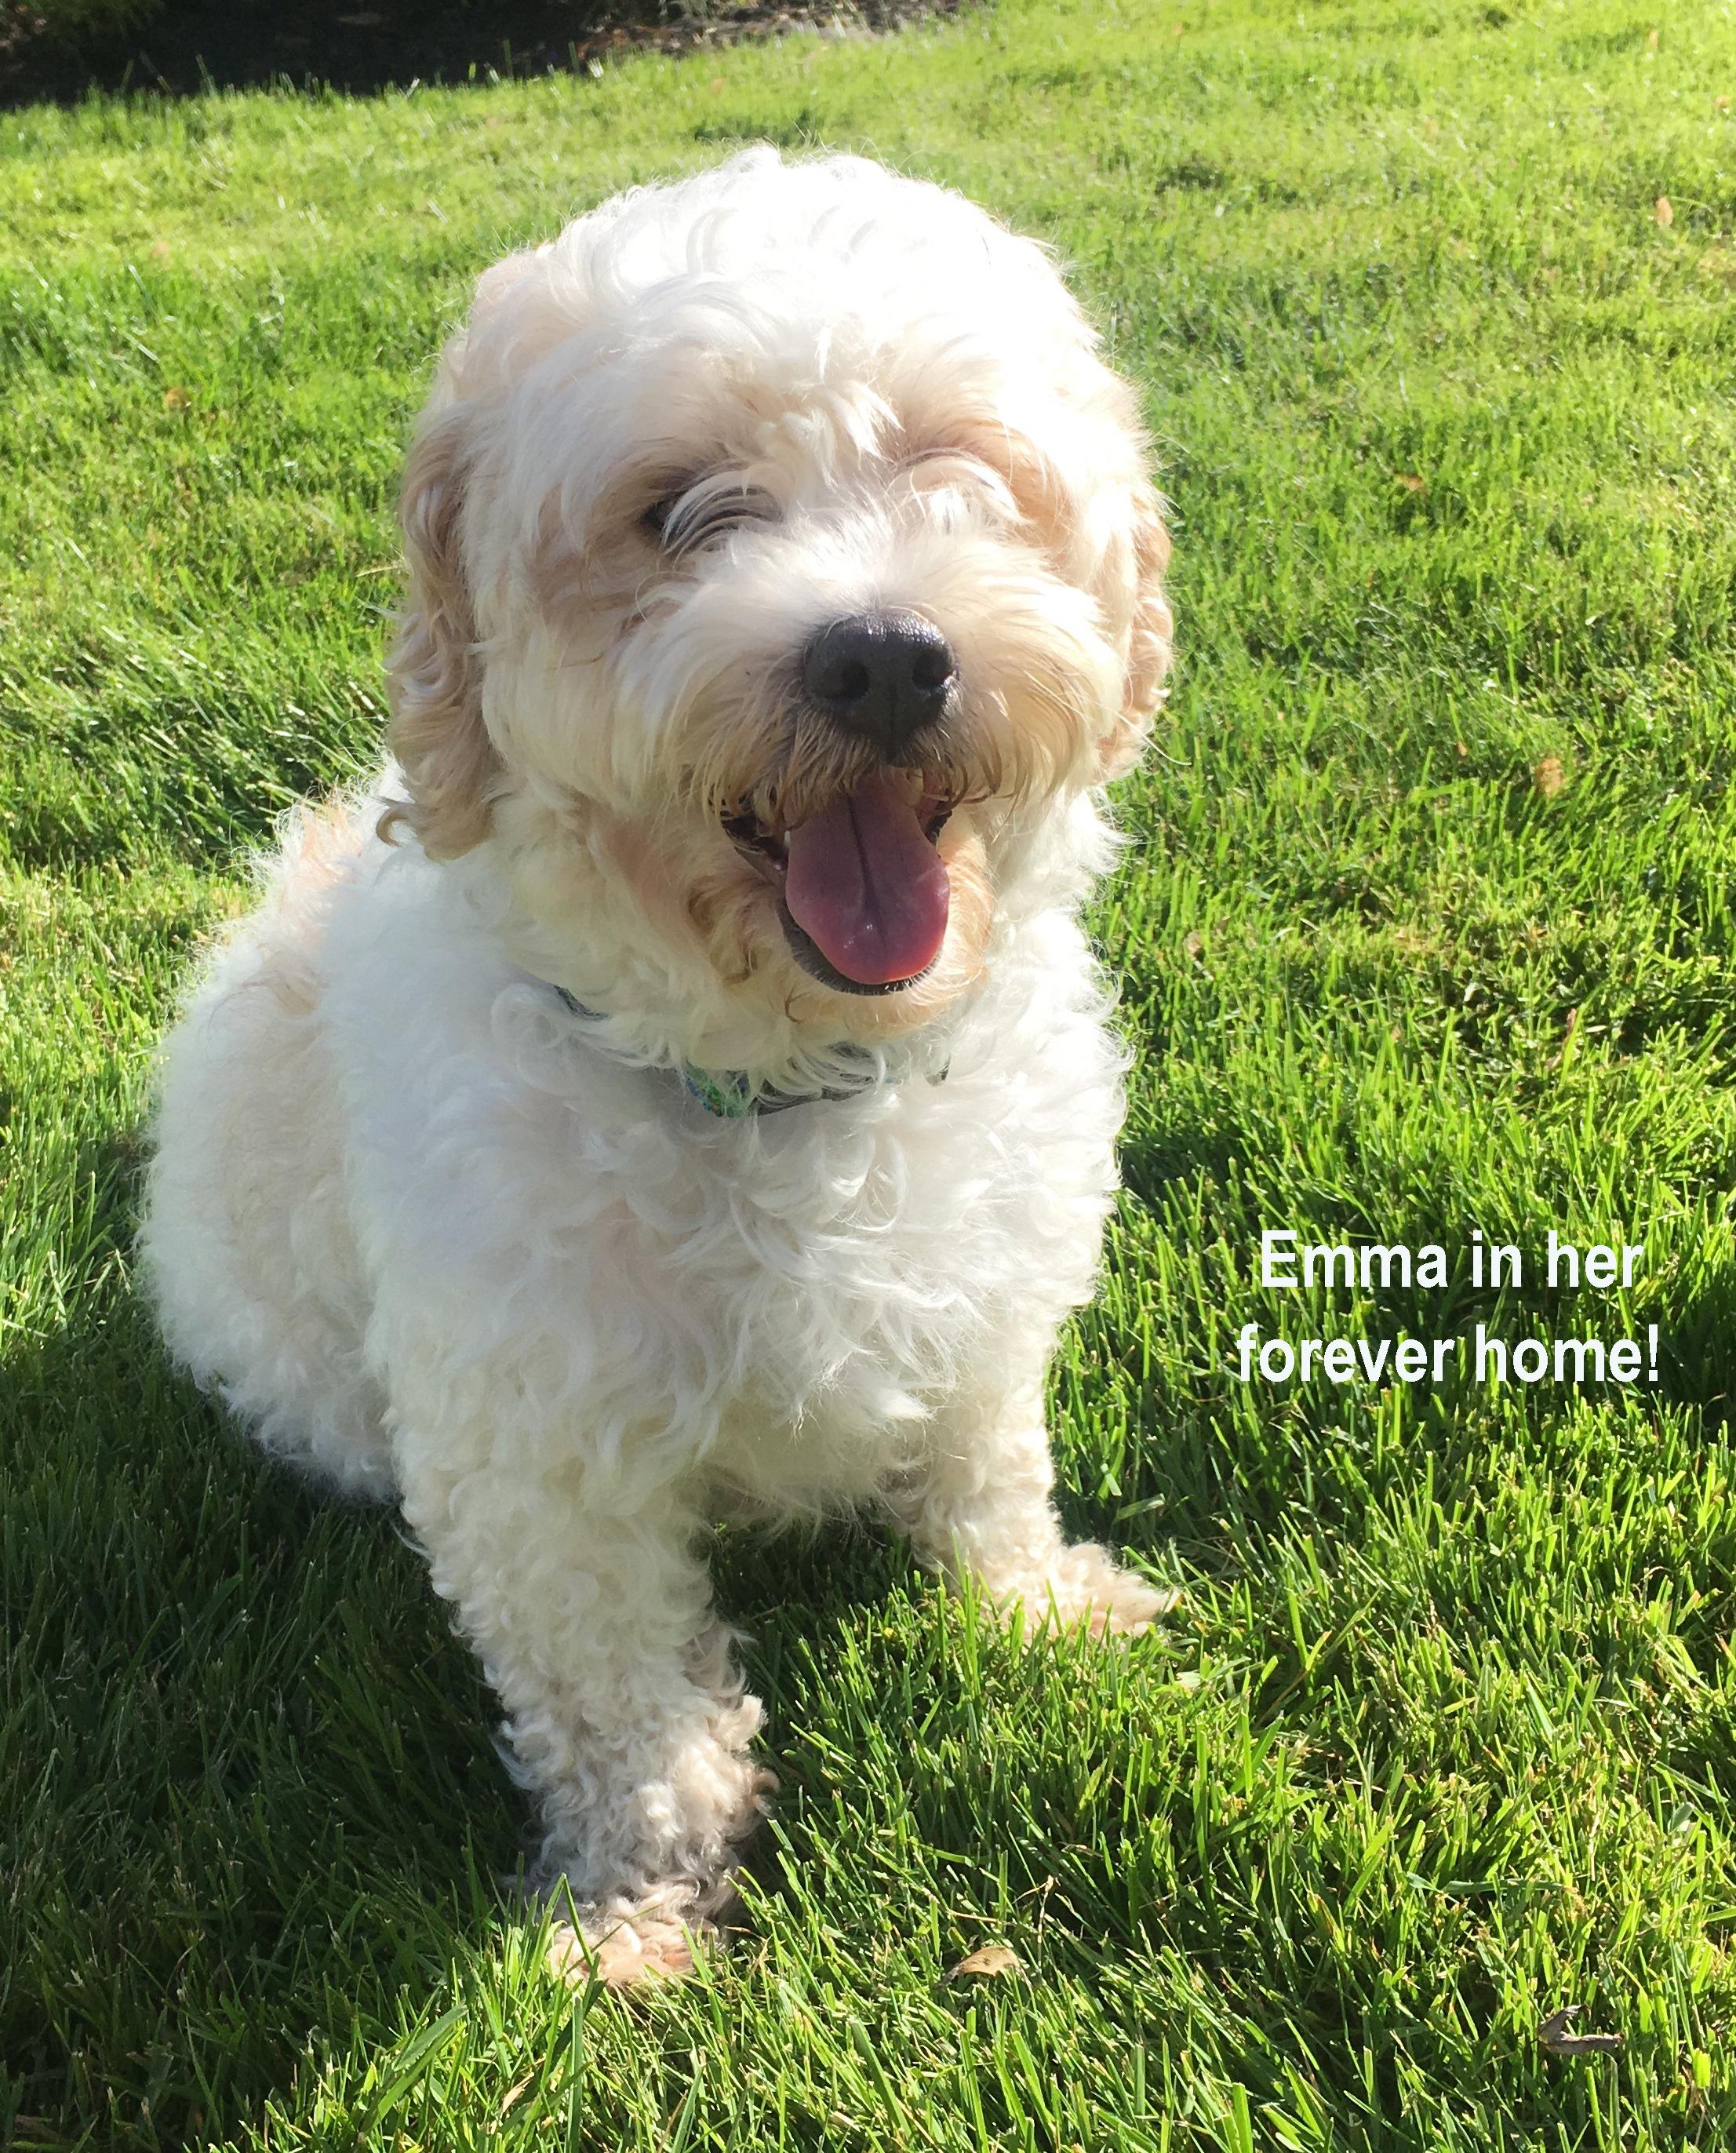 Adopted Emma